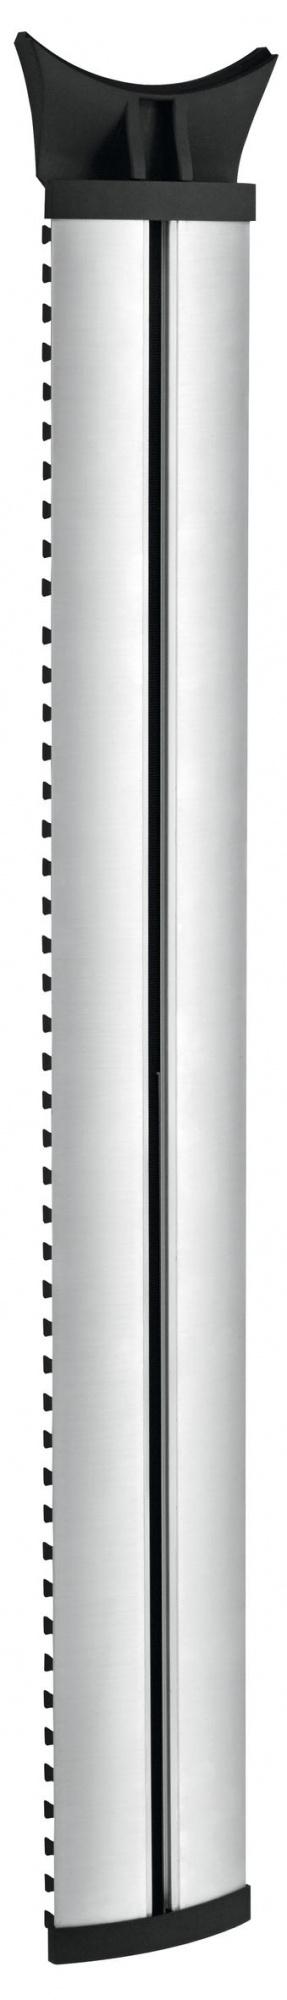 Vogel's NEXT 7840 - настенный кабель-канал (Silver)